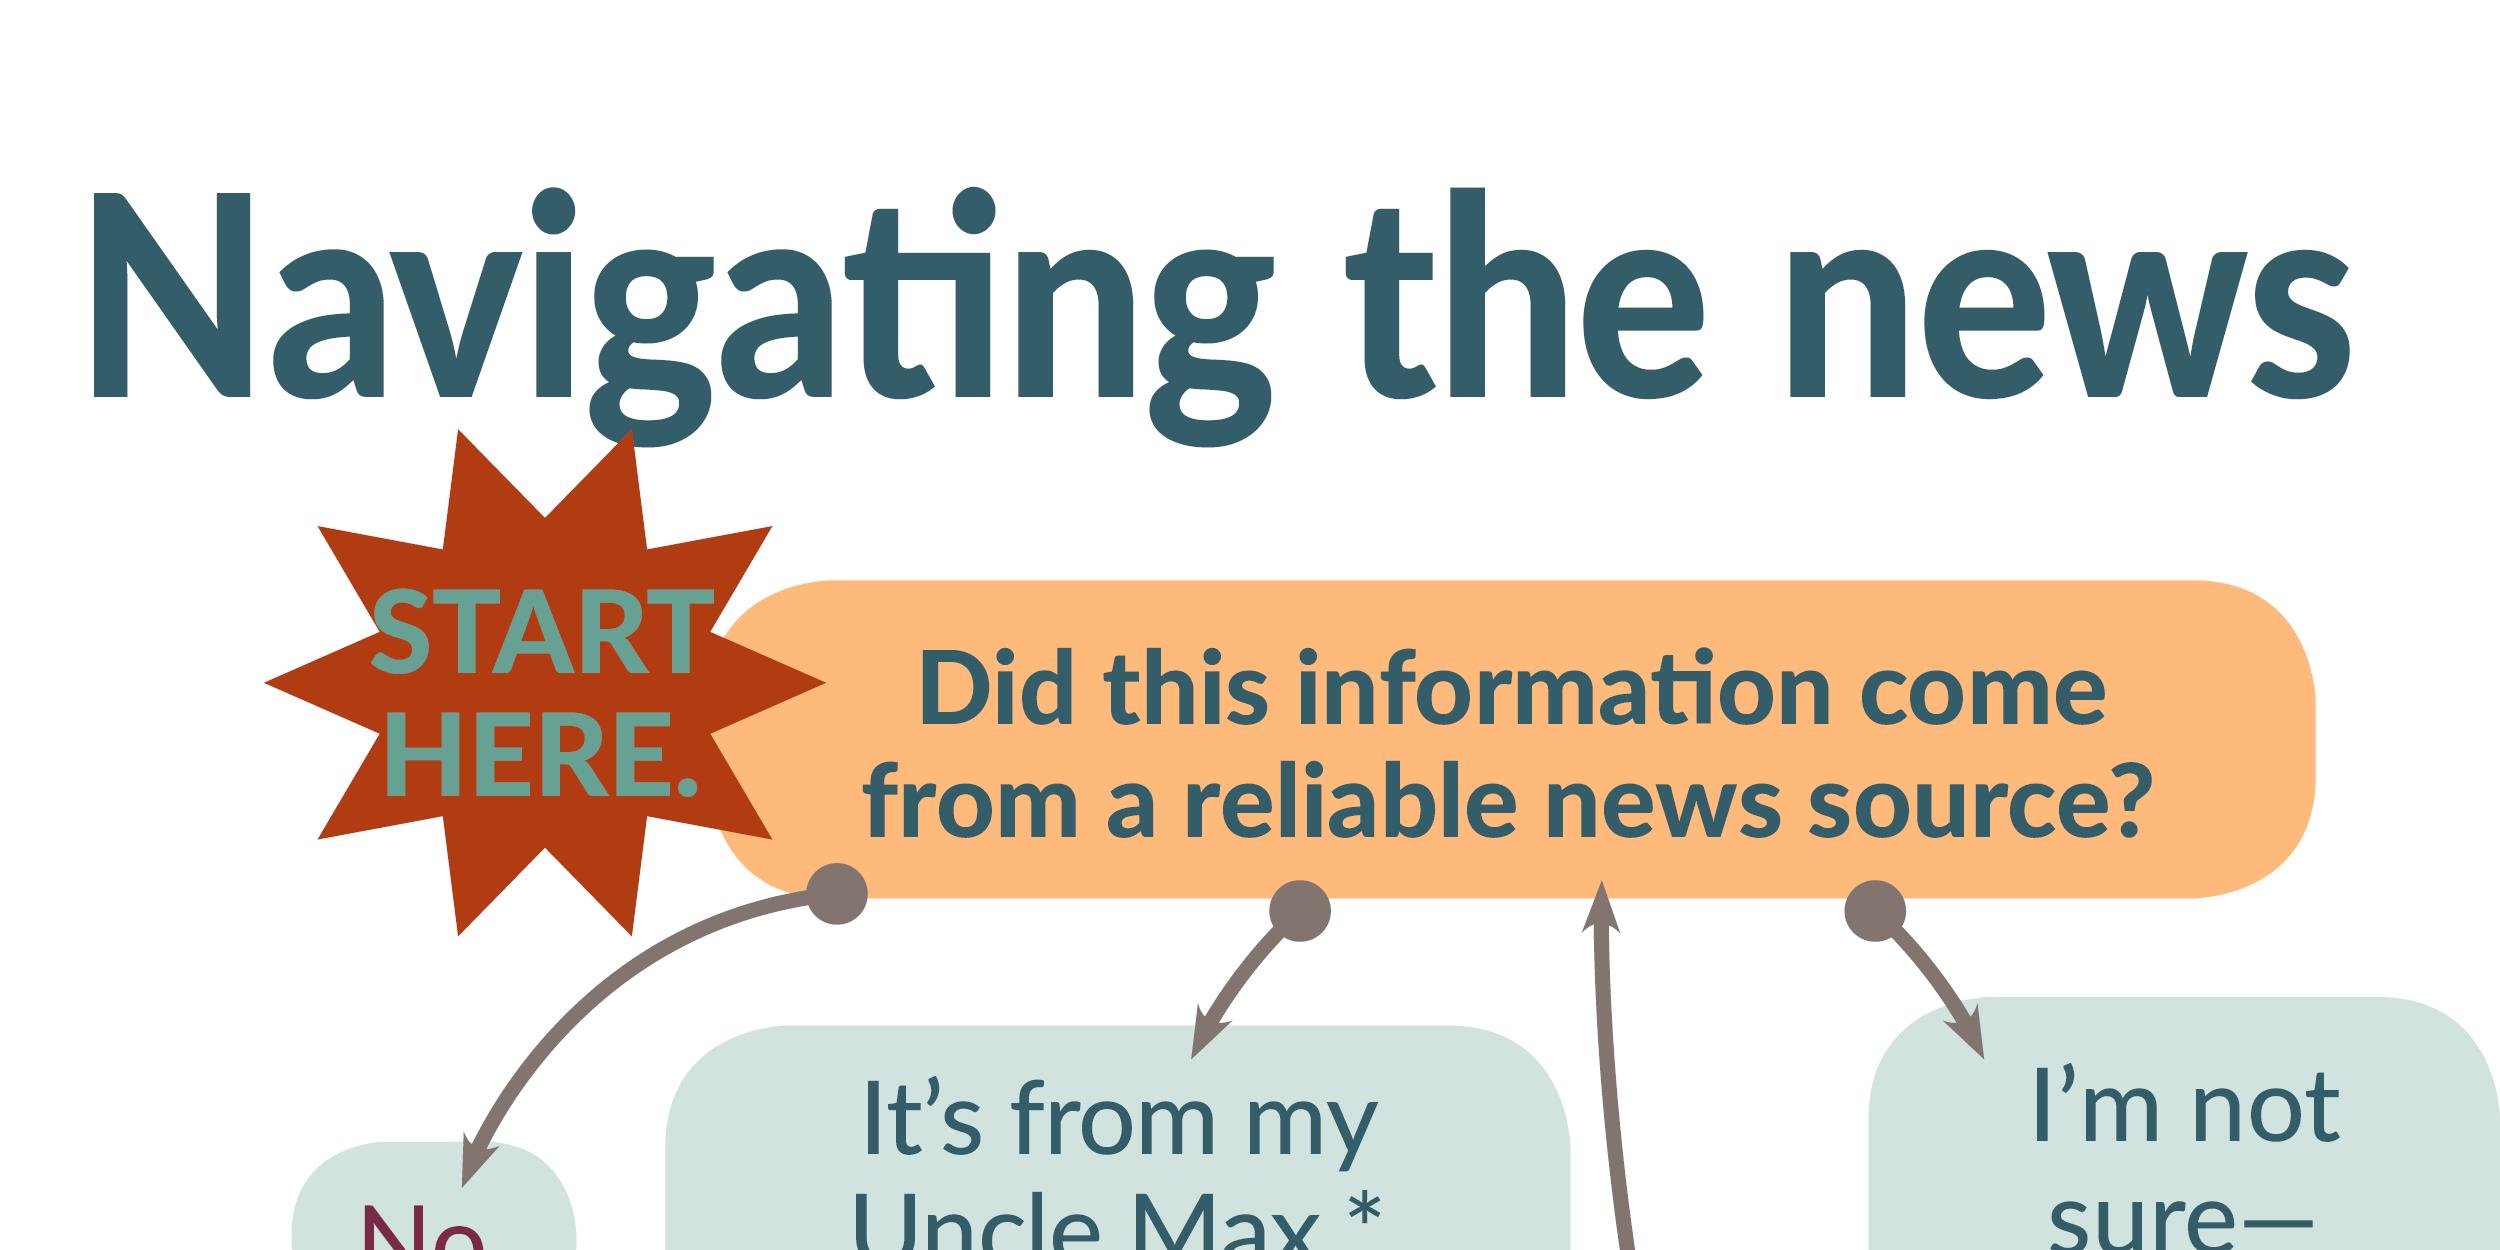 INFOGRAPHIC: Navigating the news